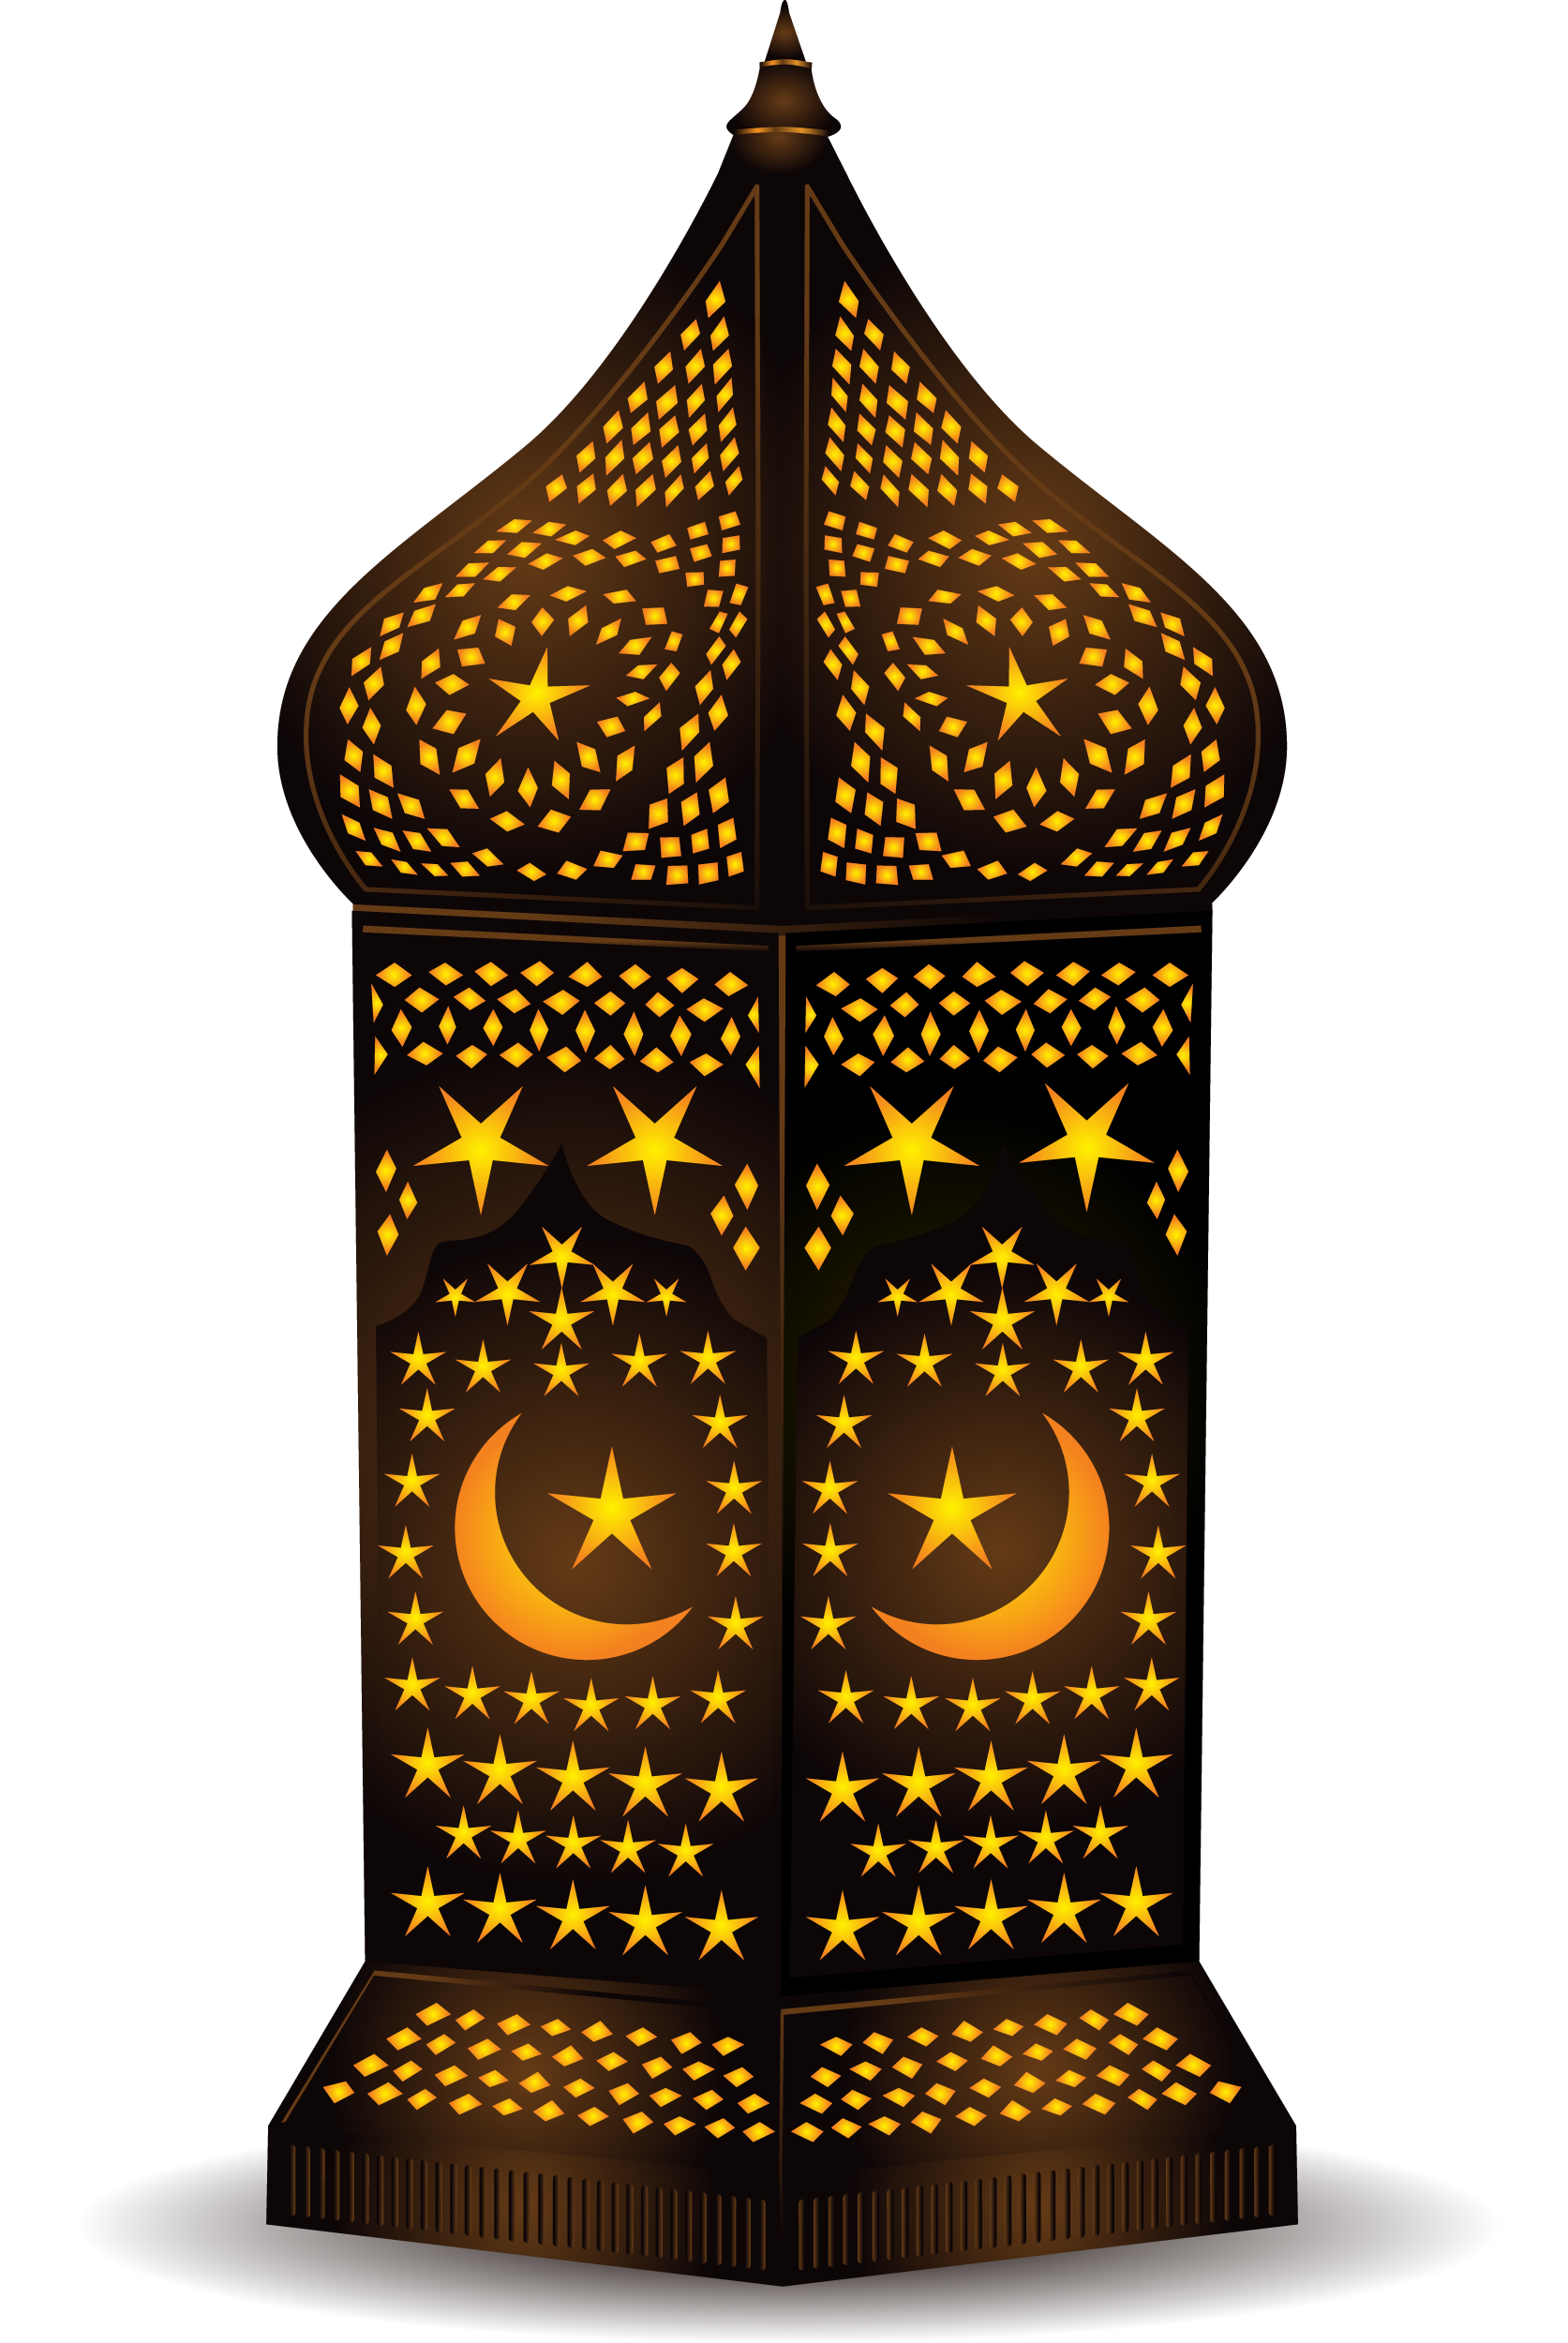 Lamp clipart eid. Lantern ramadan al fitr